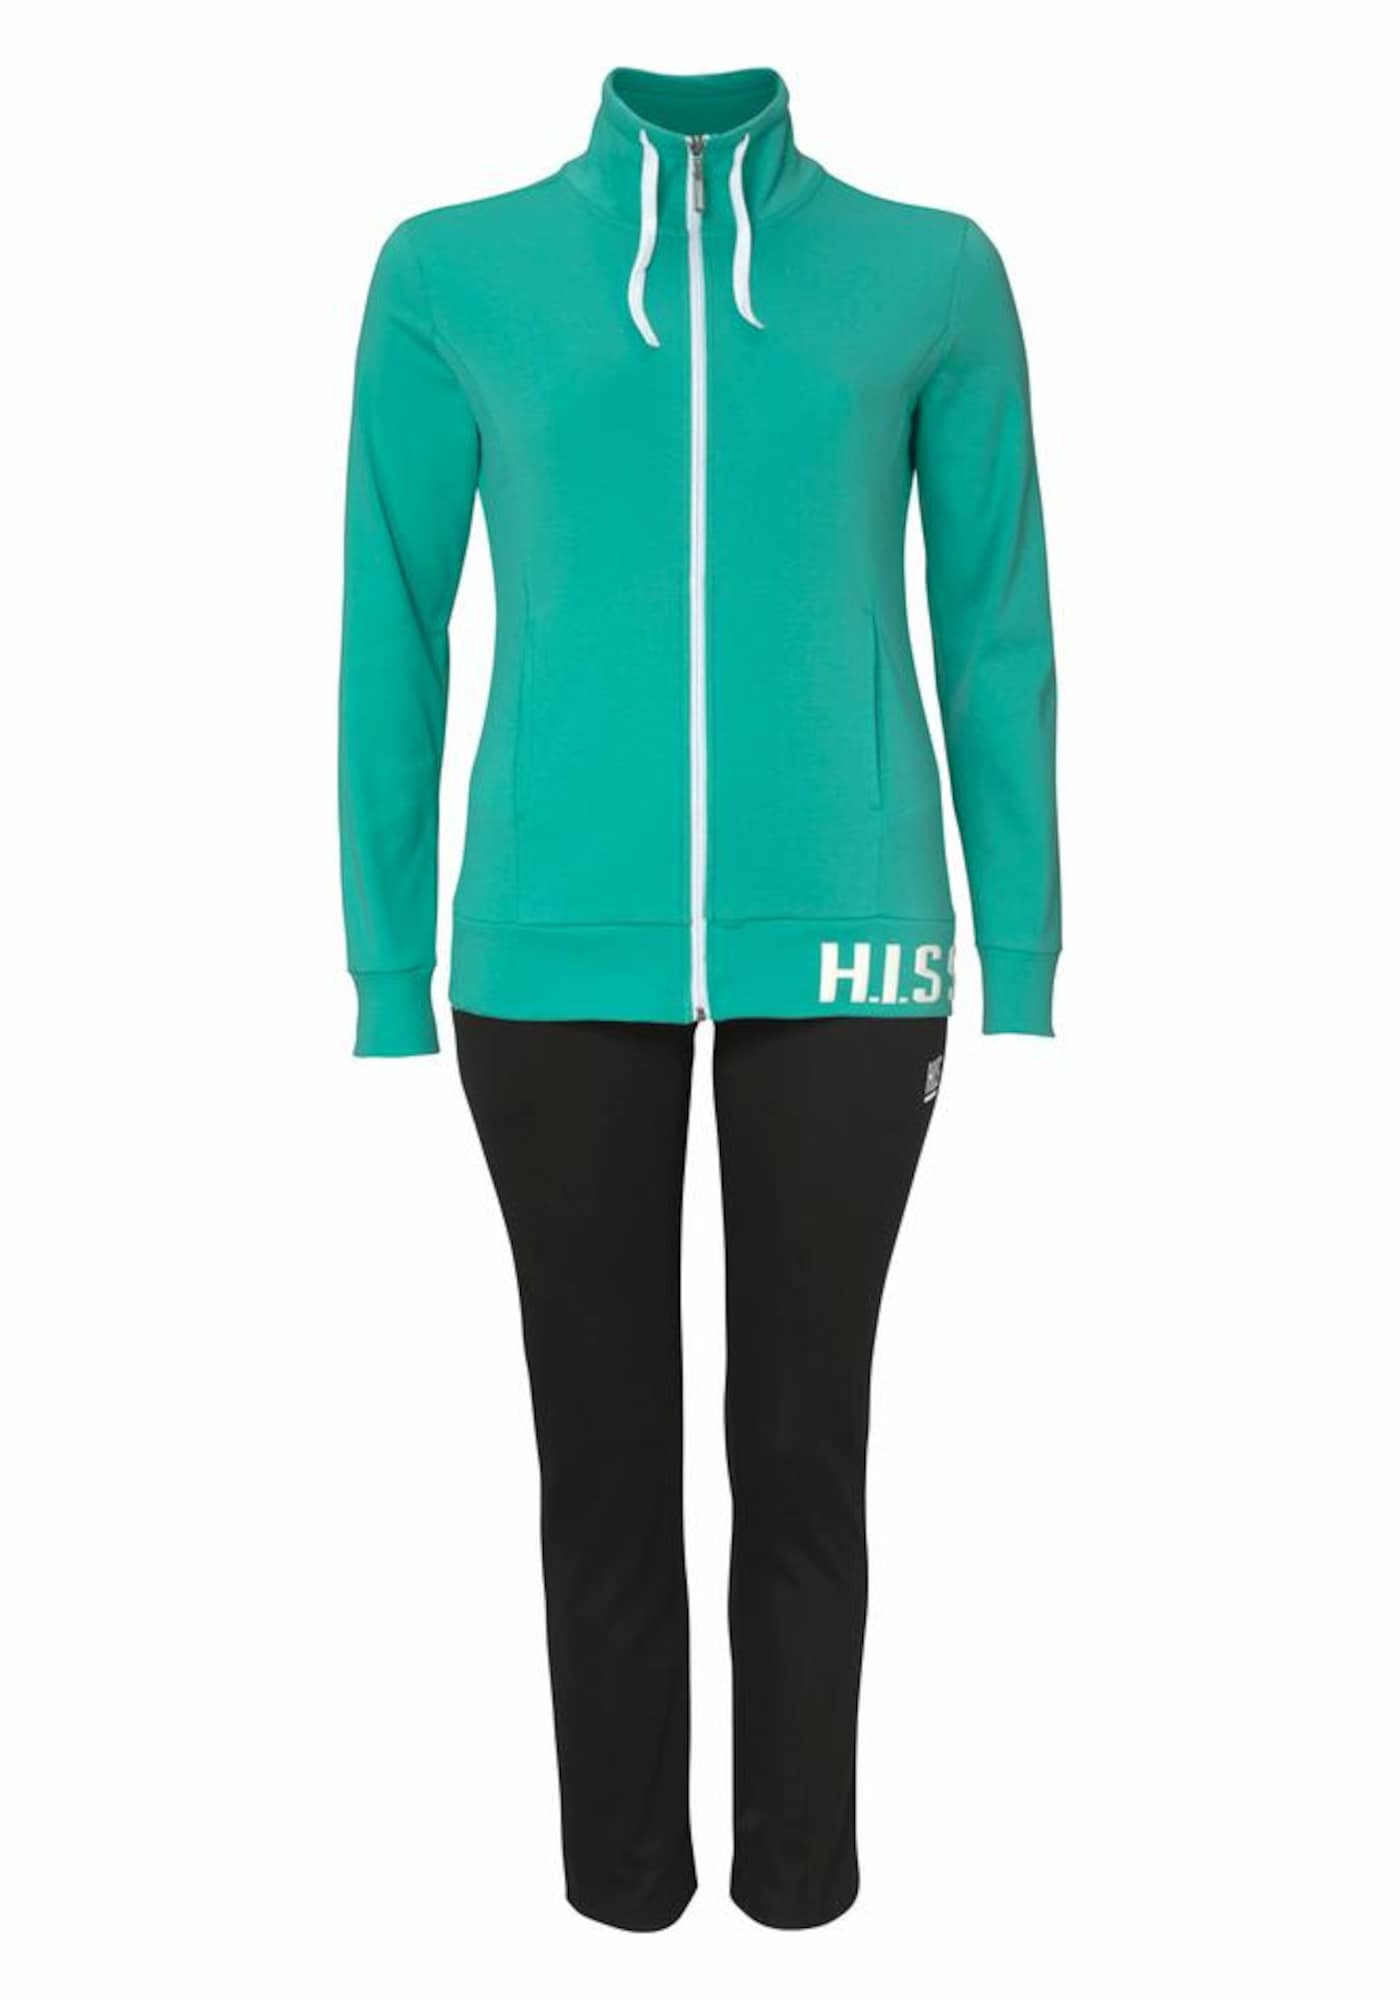 Jogginganzug | Sportbekleidung > Sportanzüge > Jogginganzüge | H.I.S